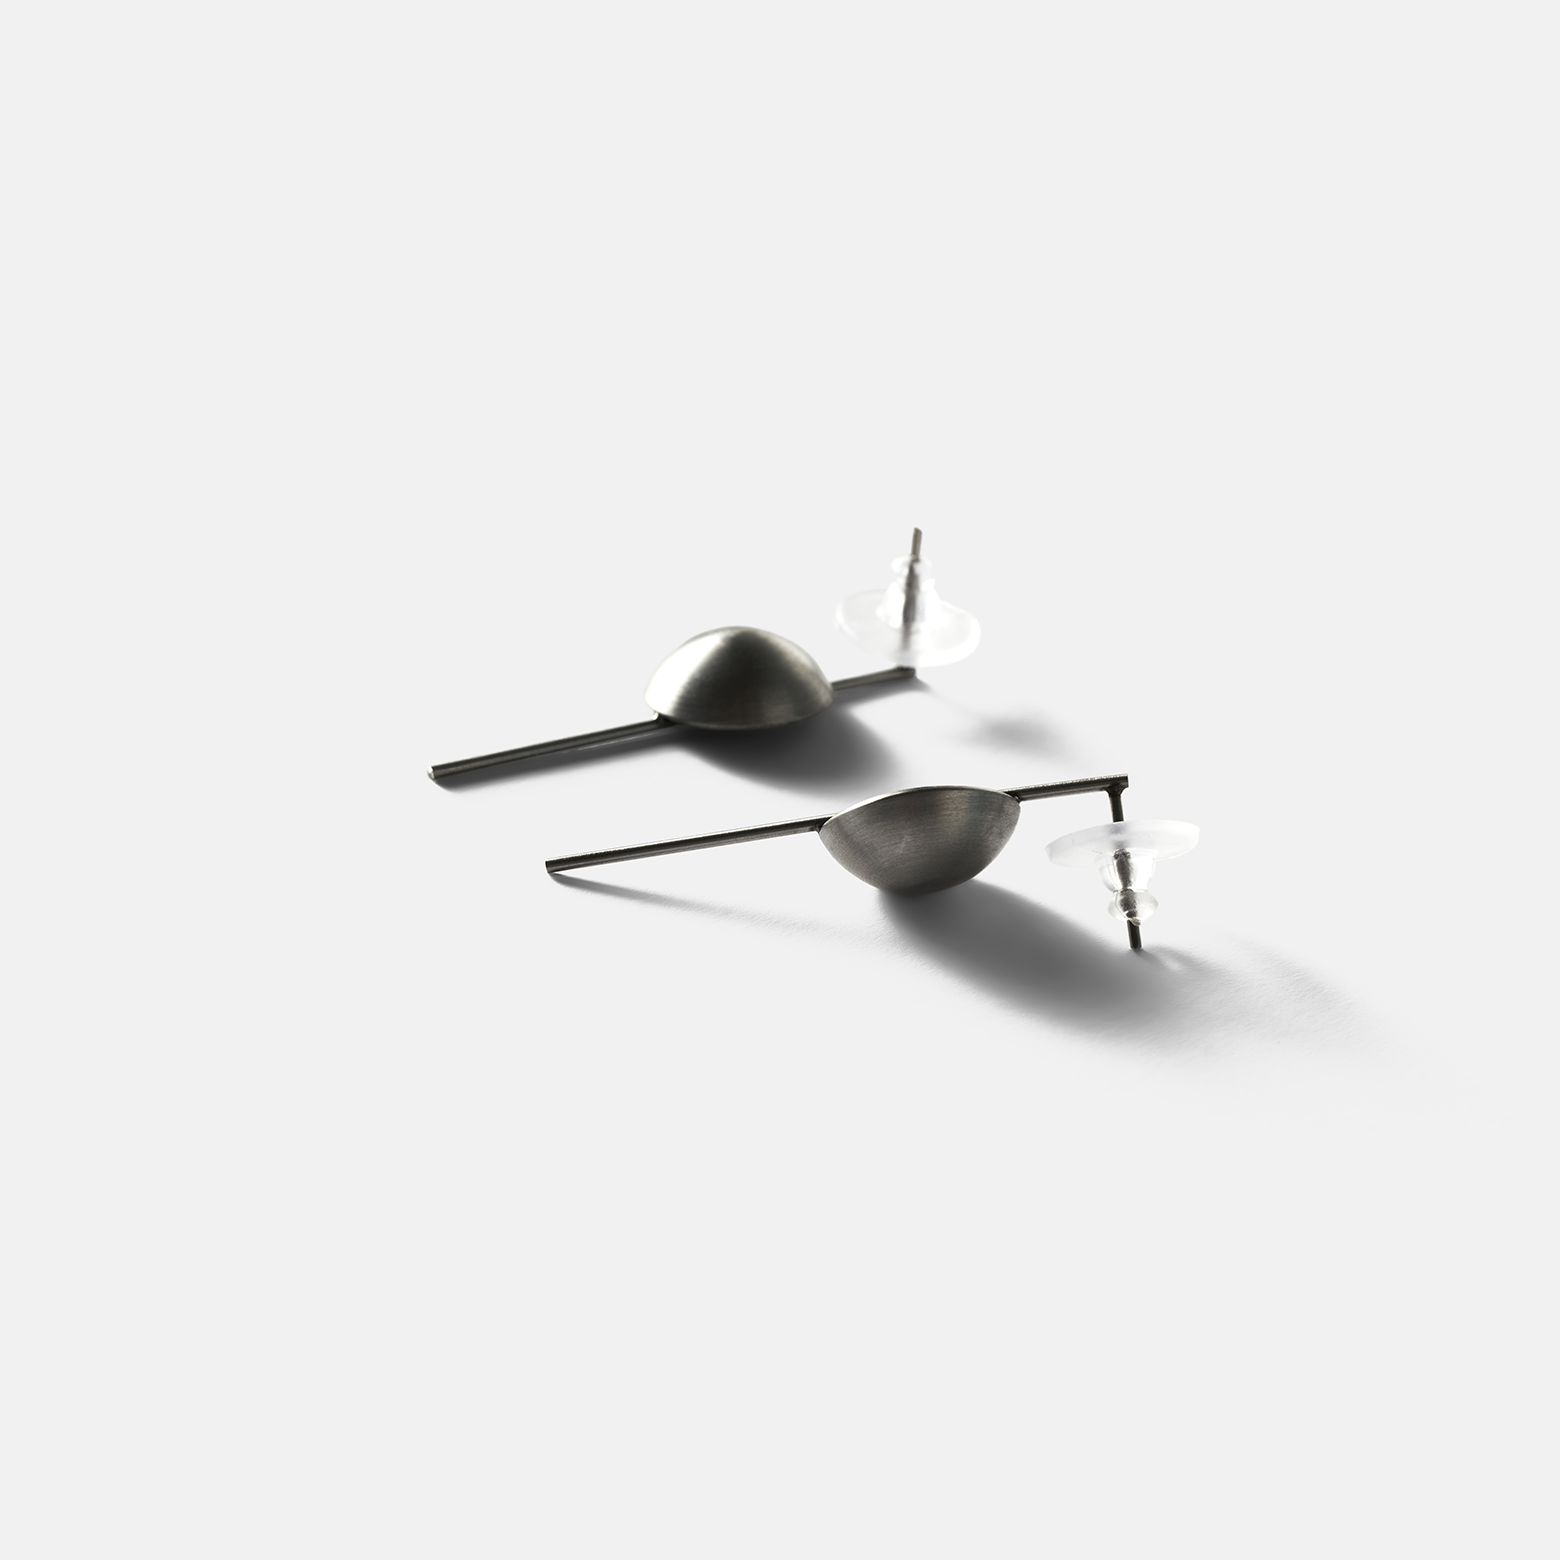 Konzuk Linnea Minor Earrings — серьги из бетона и стали